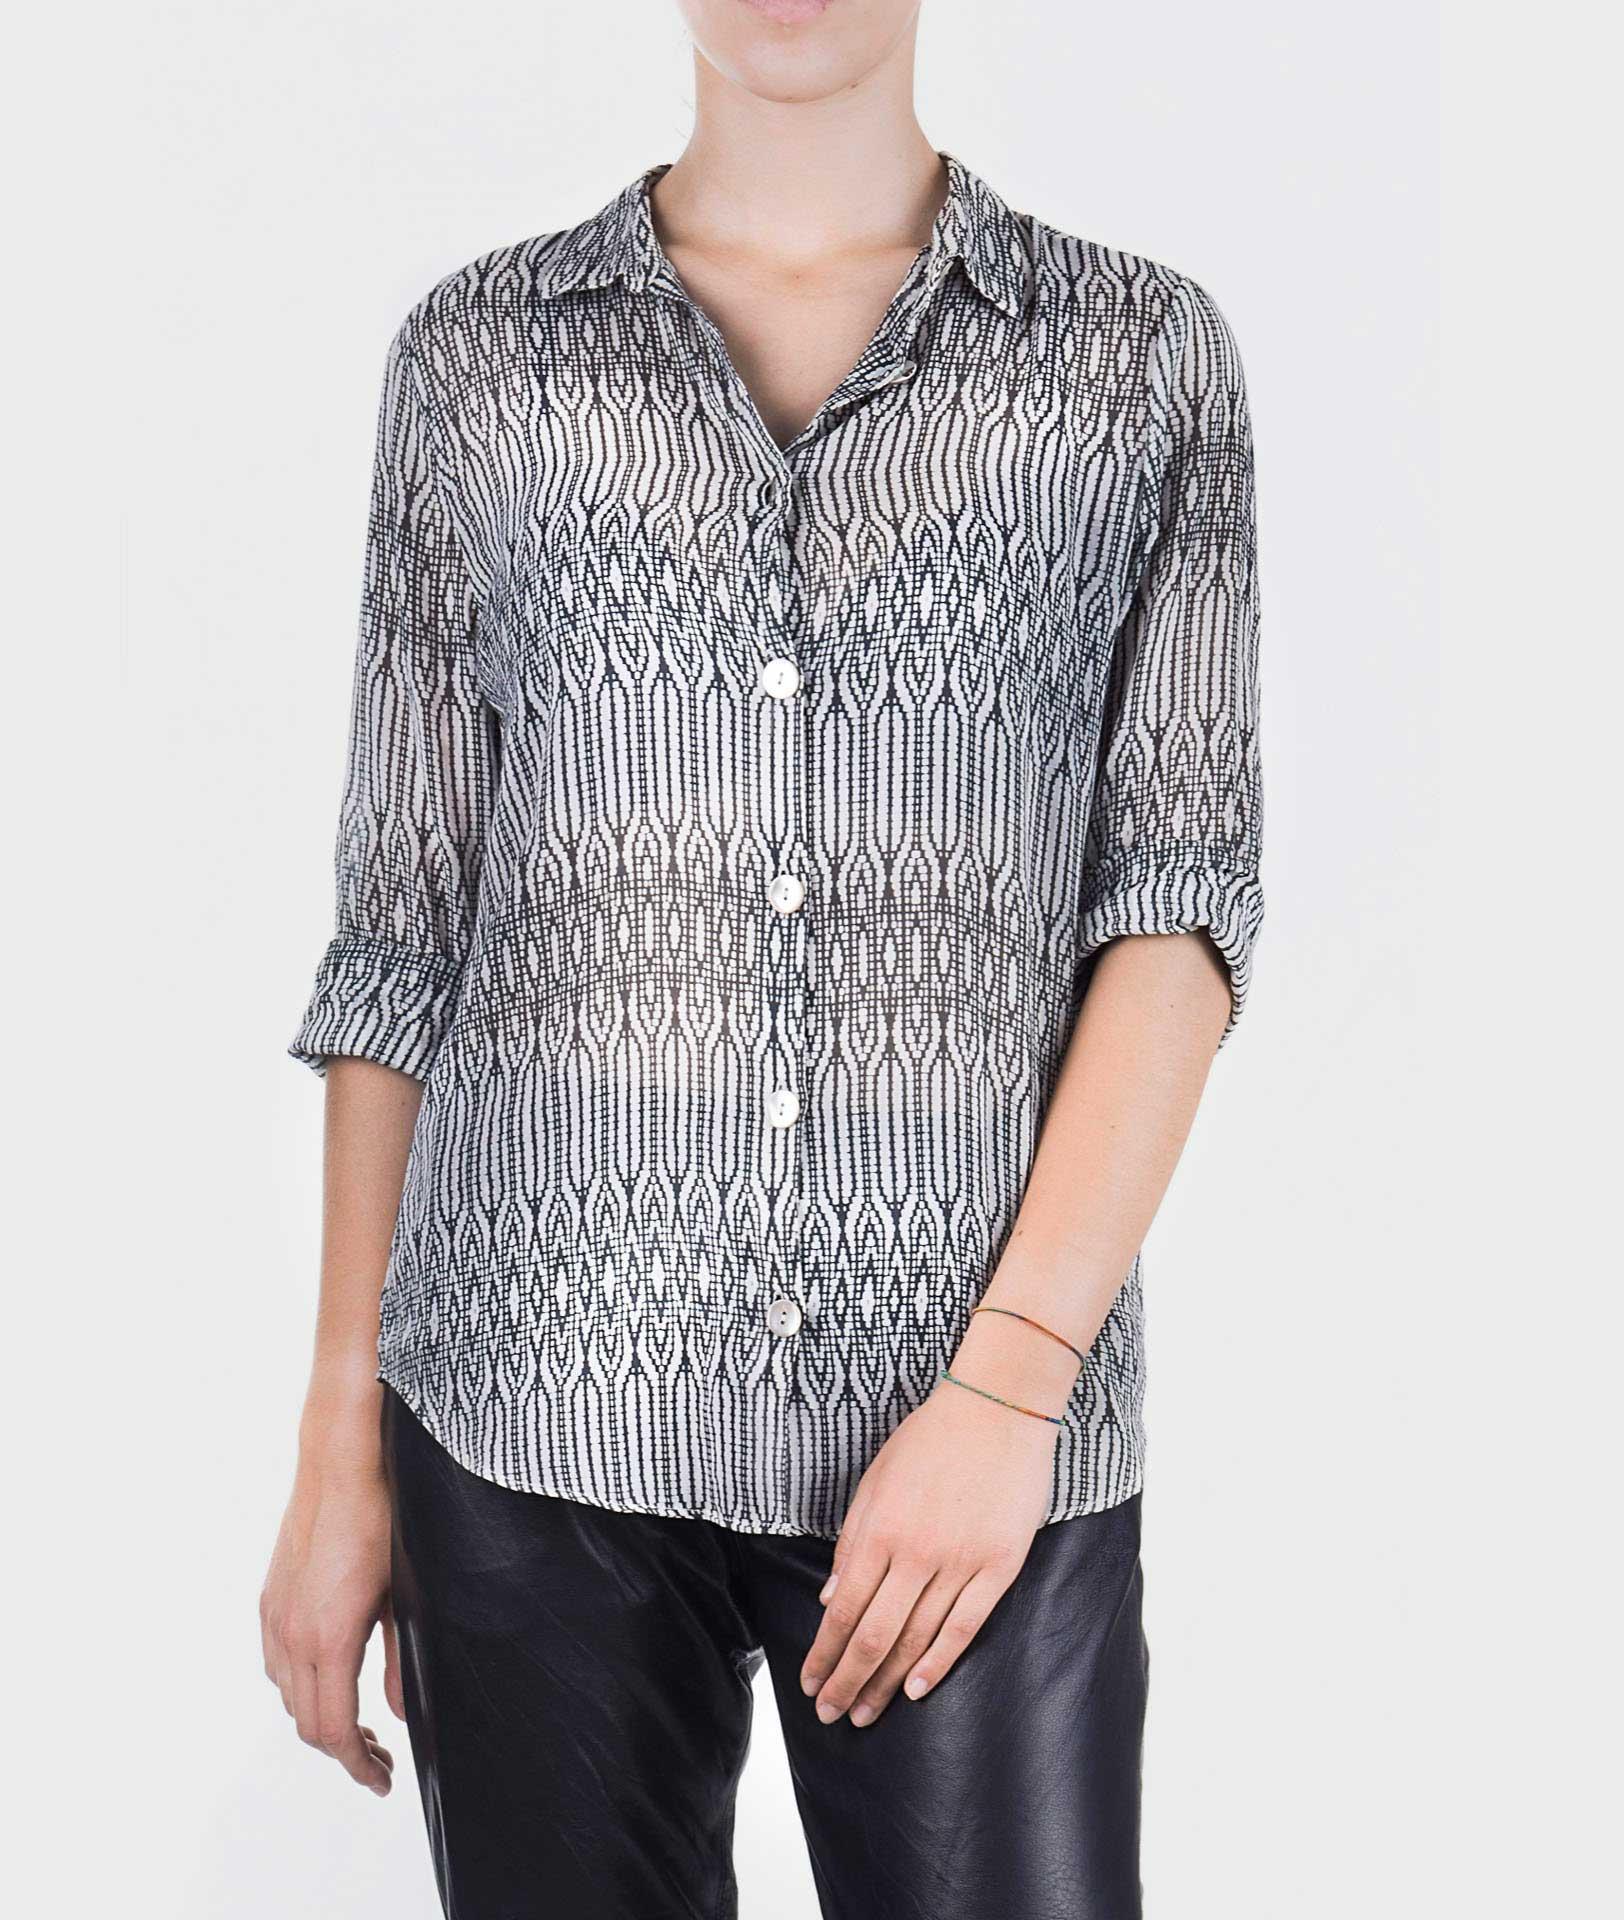 foto ecommerce vestiti donna indossato esempio